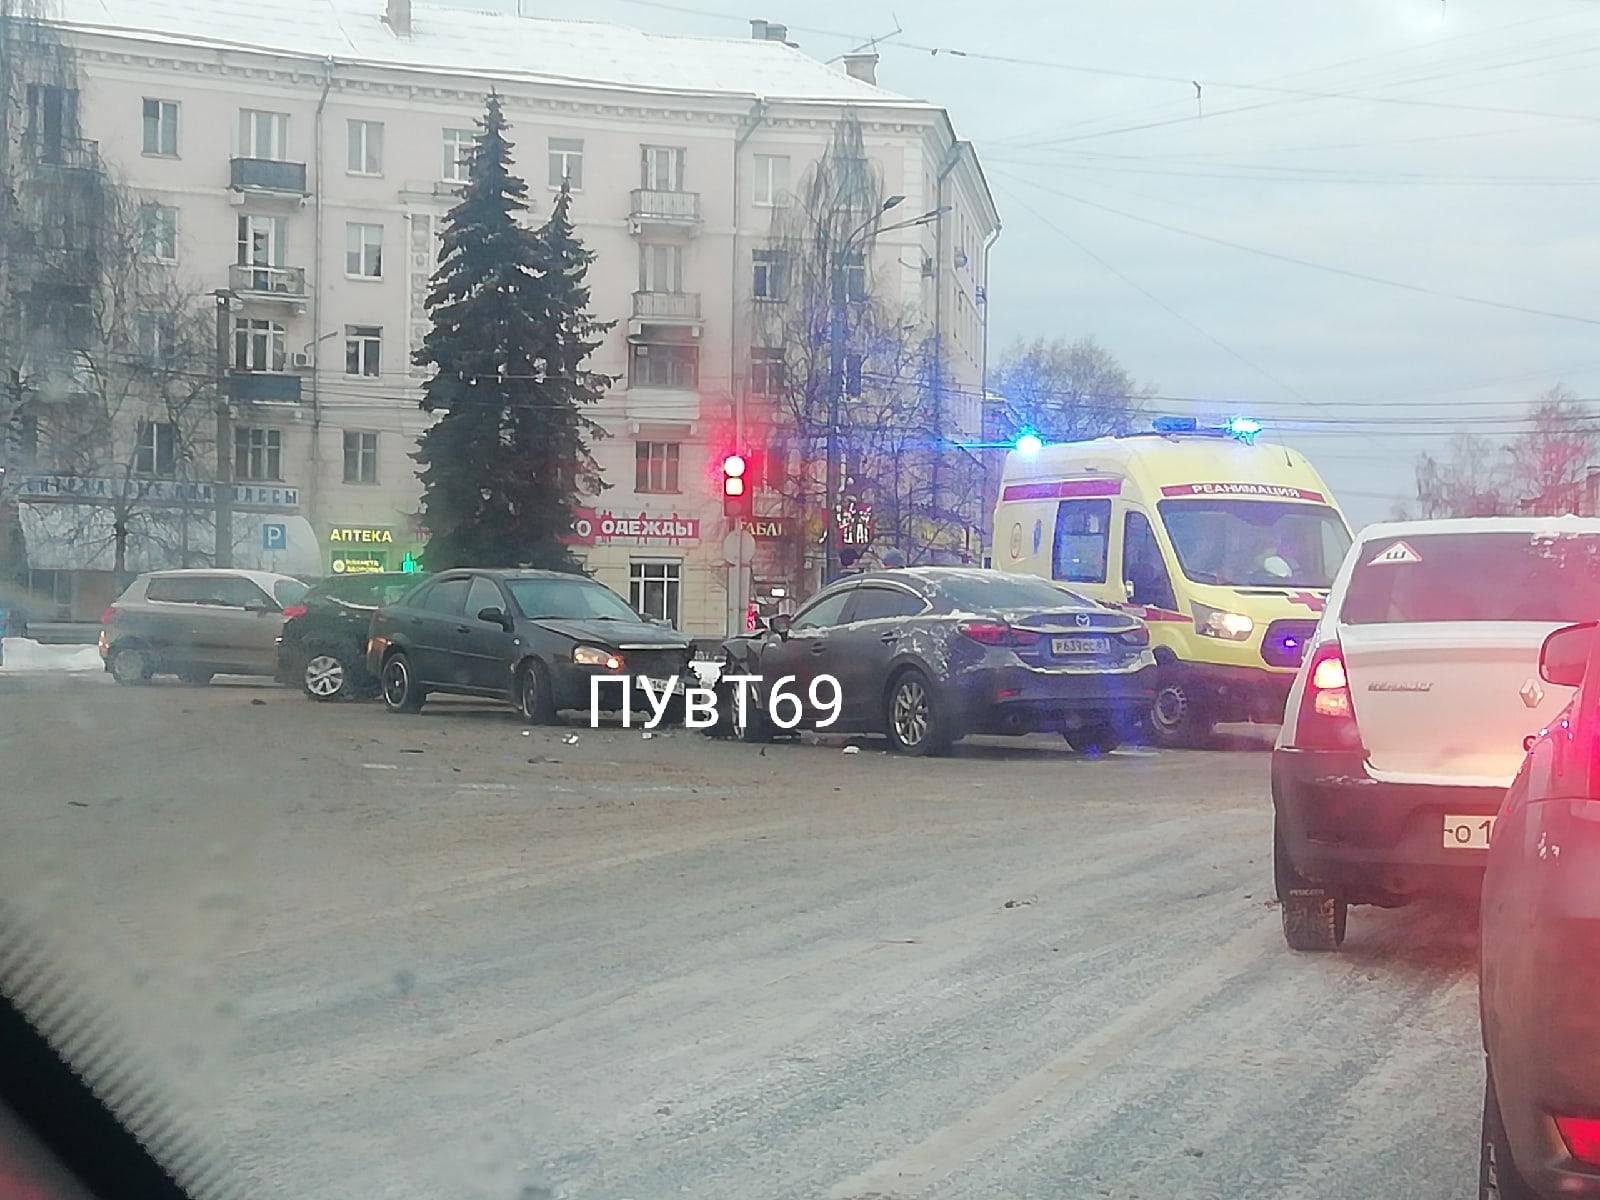 Опубликовано видео жесткого столкновения машин в Твери